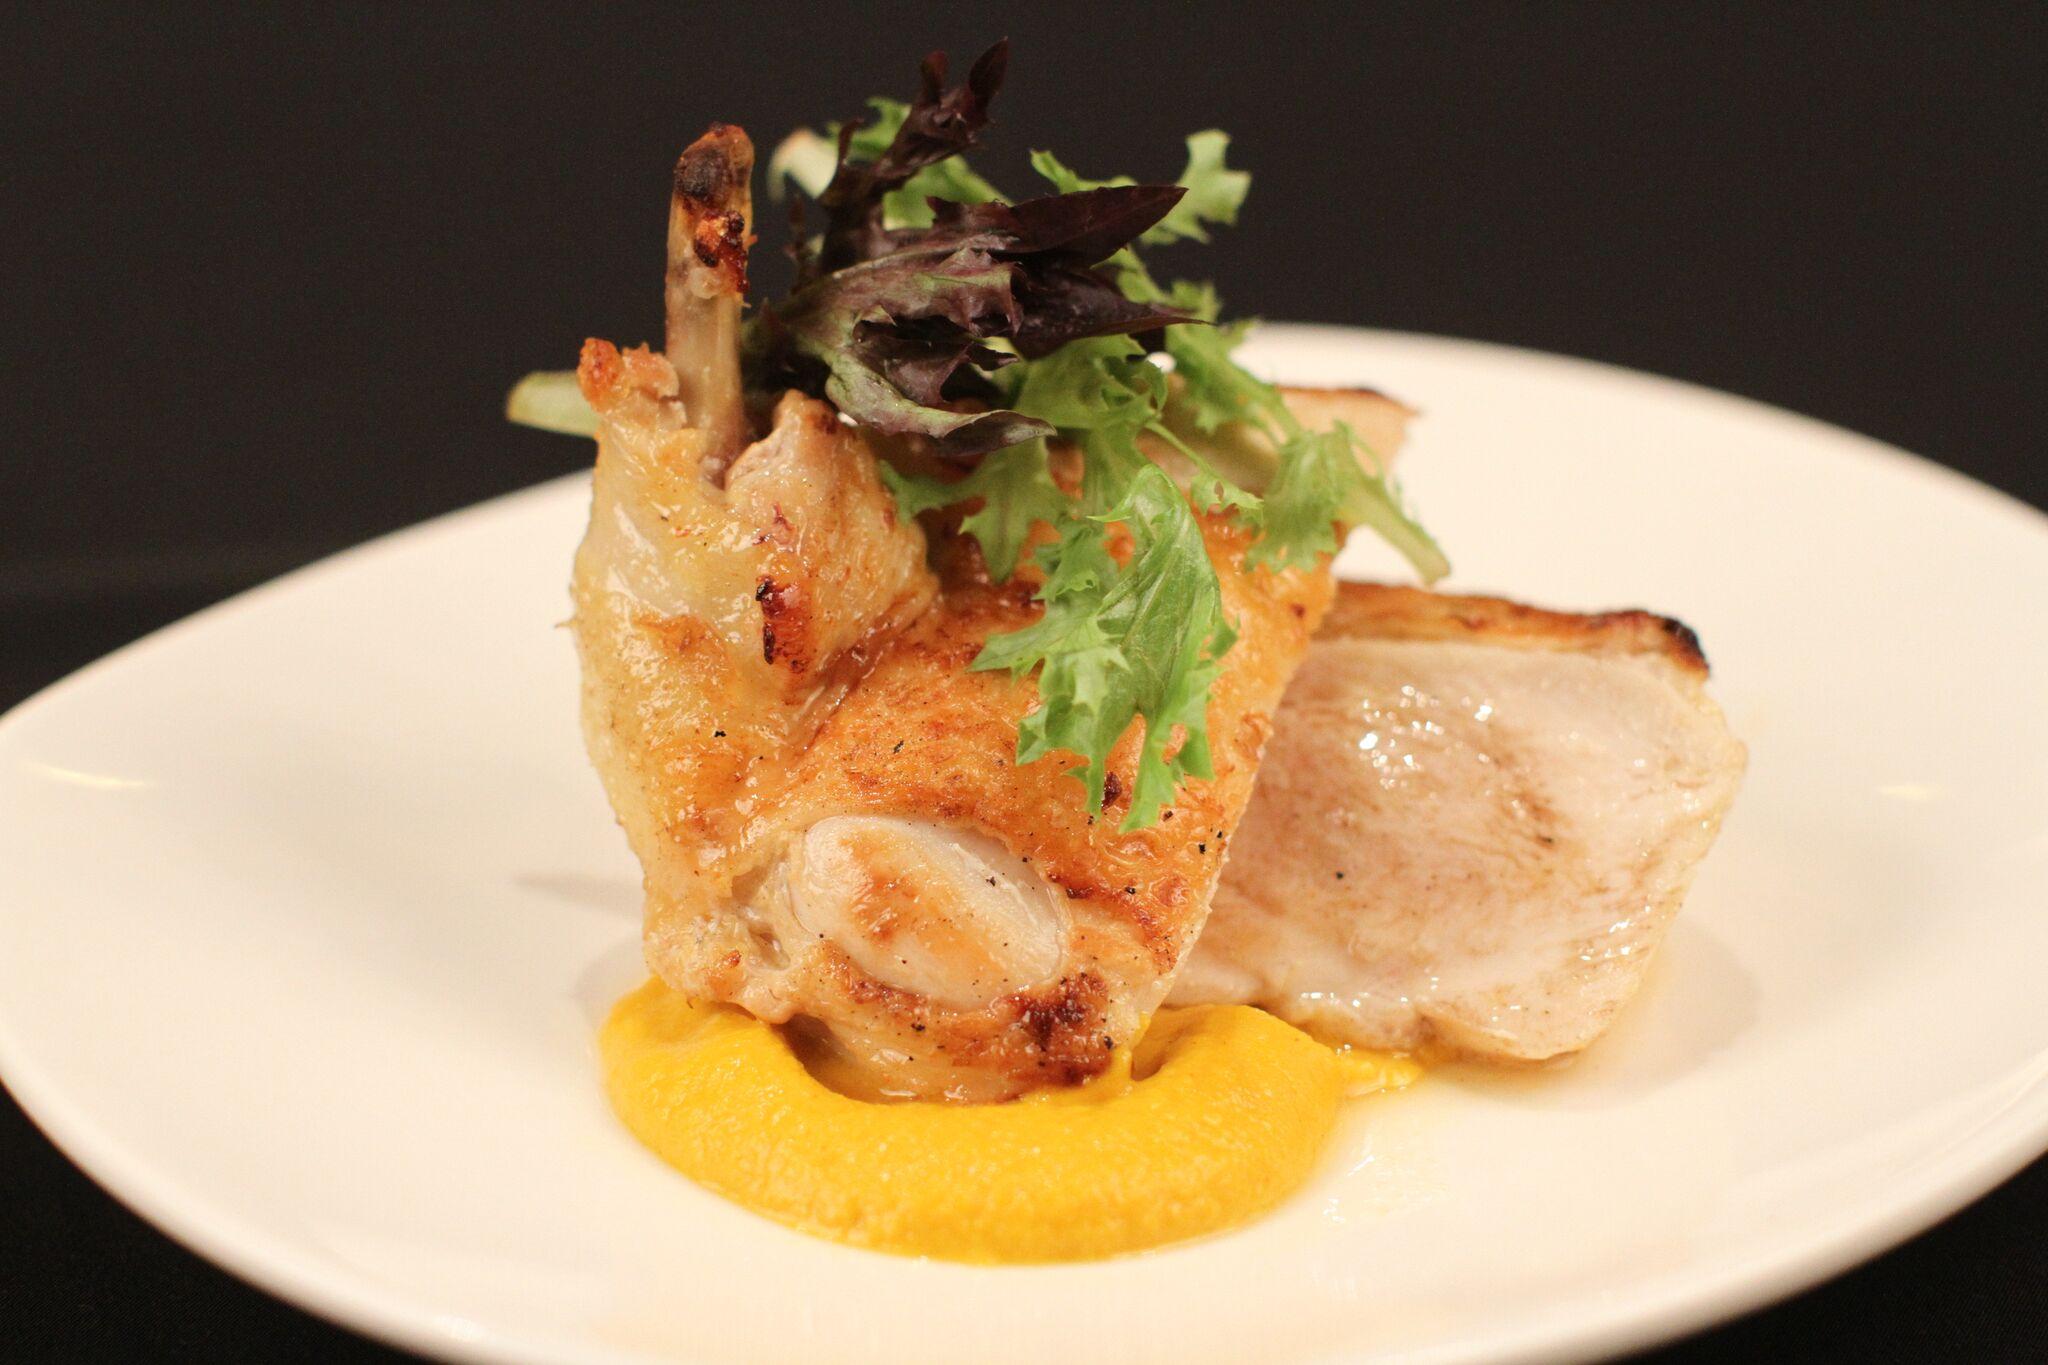 BRUNCH MENU for West Des Moines Restaurant Blu Toro Cantina + Grill Seafood